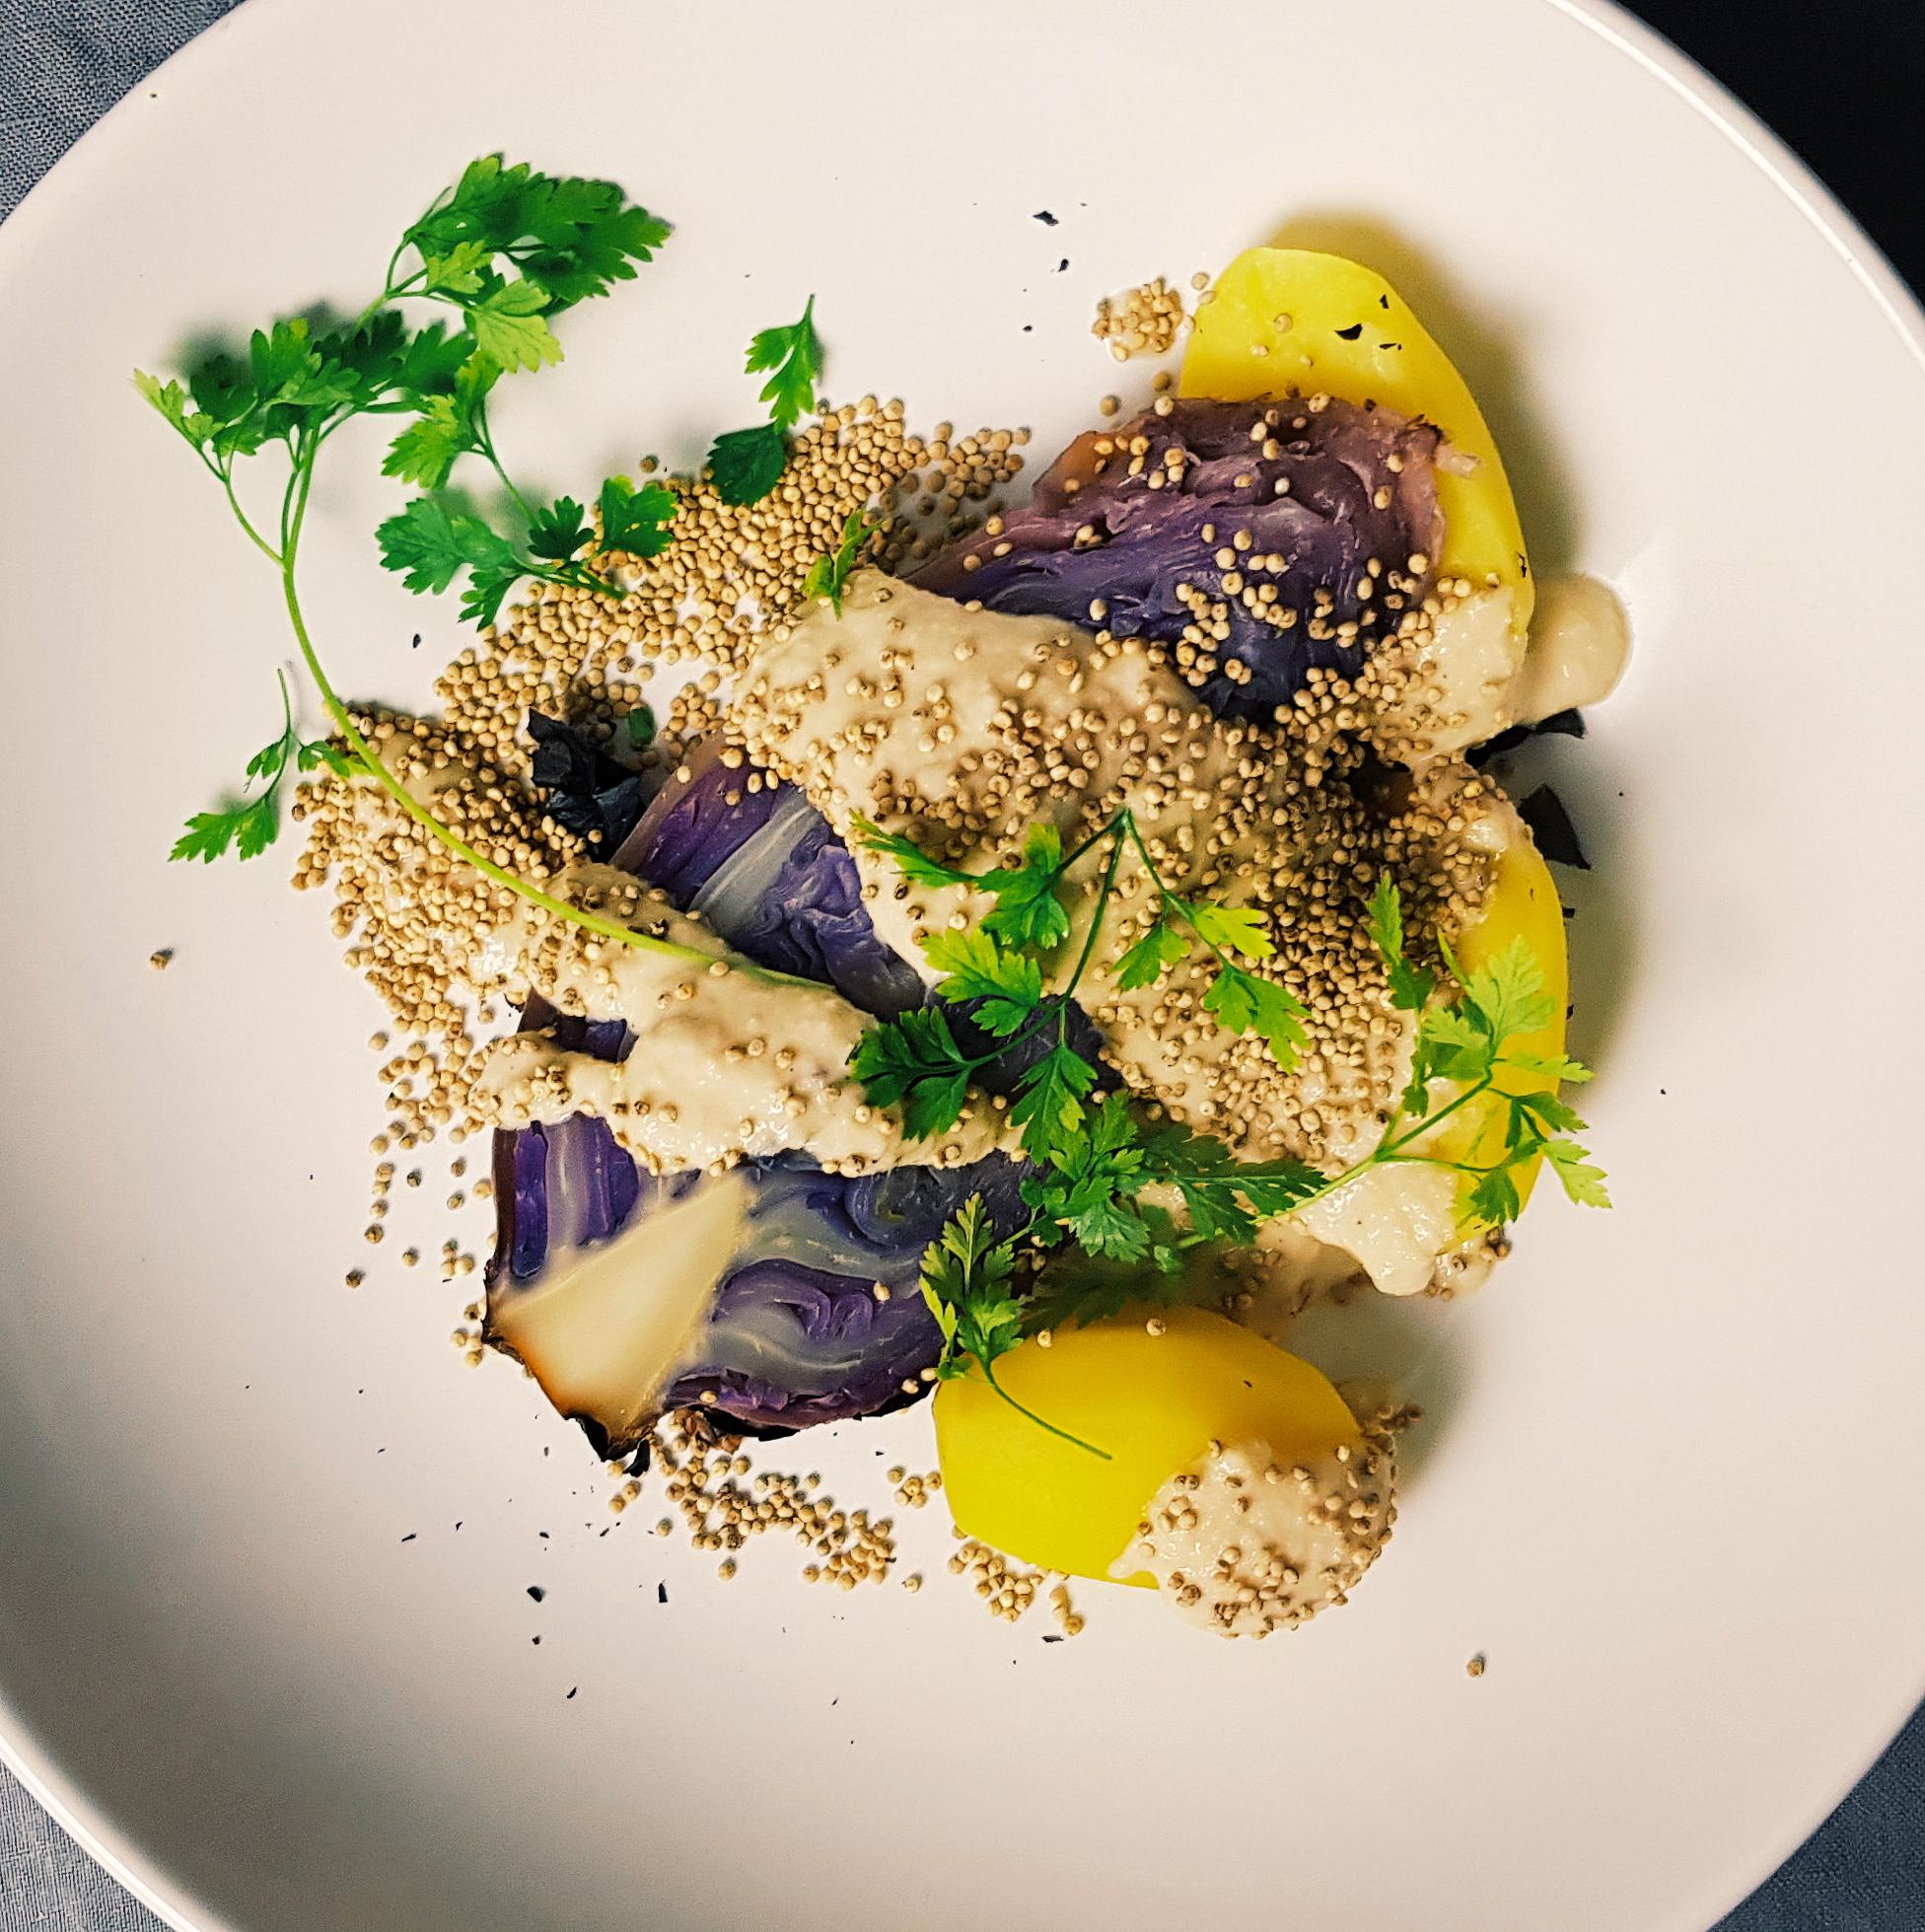 Spitzkohl mit veganer Knoblauchsauce